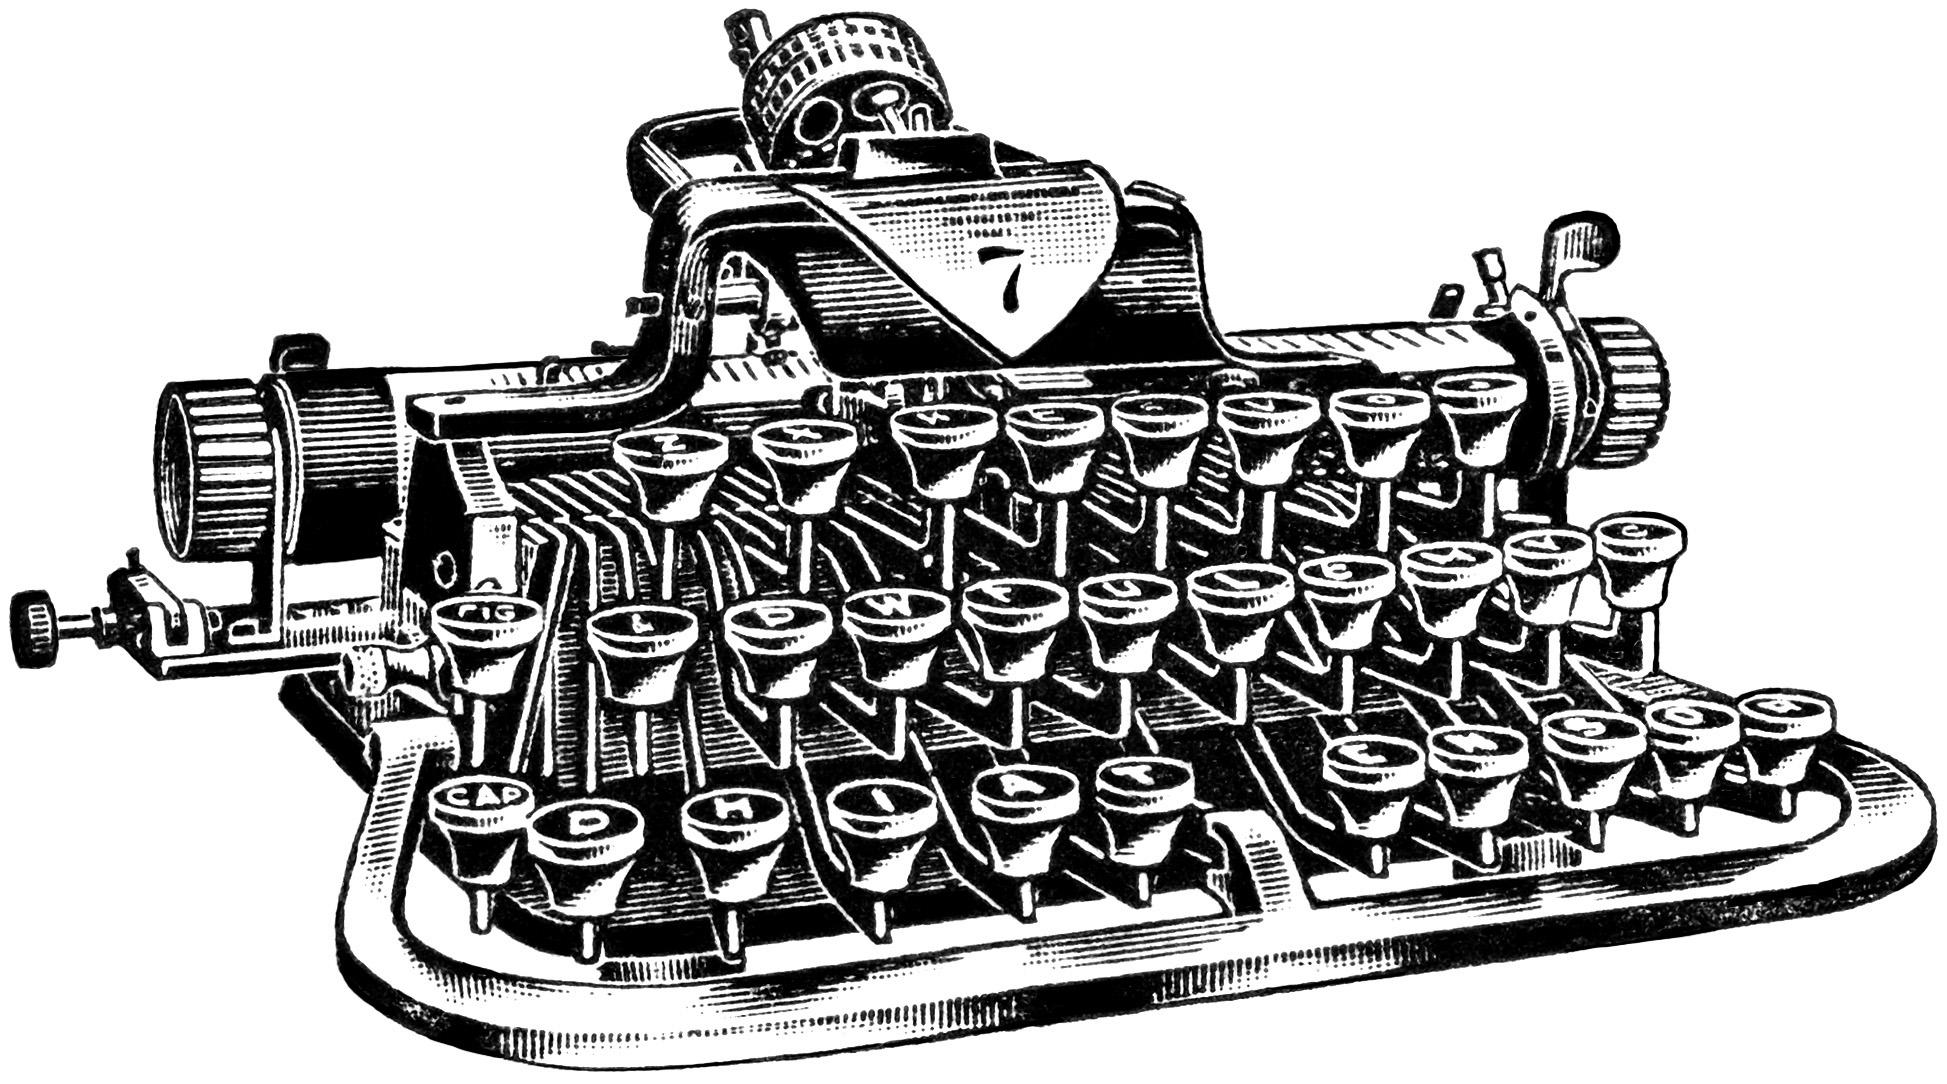 vintage typewriter clipart, antique typewriter digital graphics, old magazine advertisement, vintage office clip art, black and white typewriter image